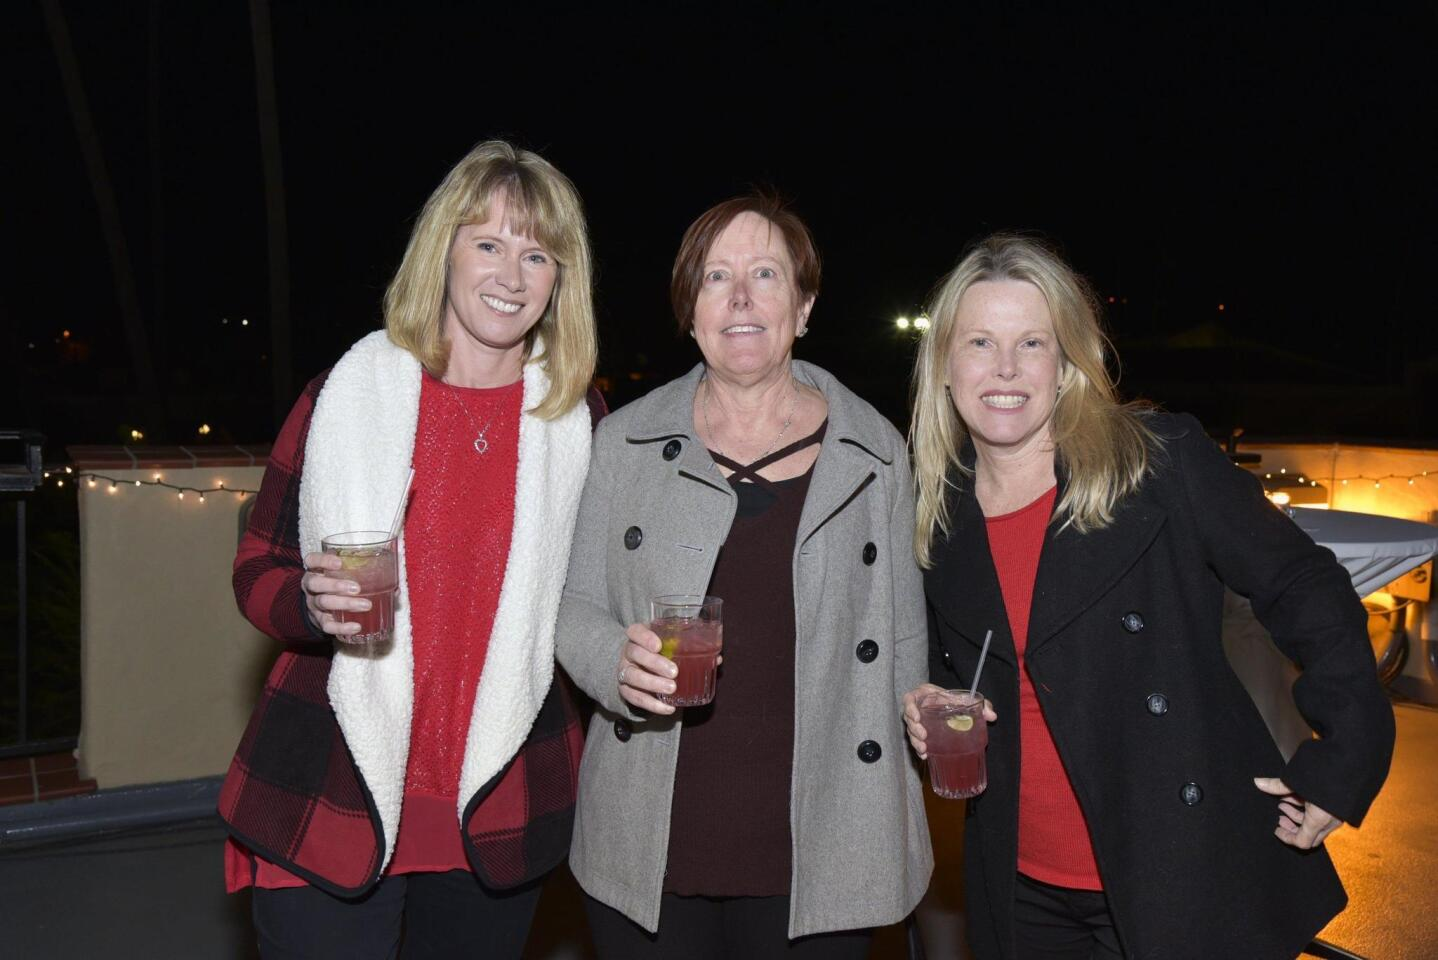 Community Resource Center holds 'Jingle & Mingle' fundraiser